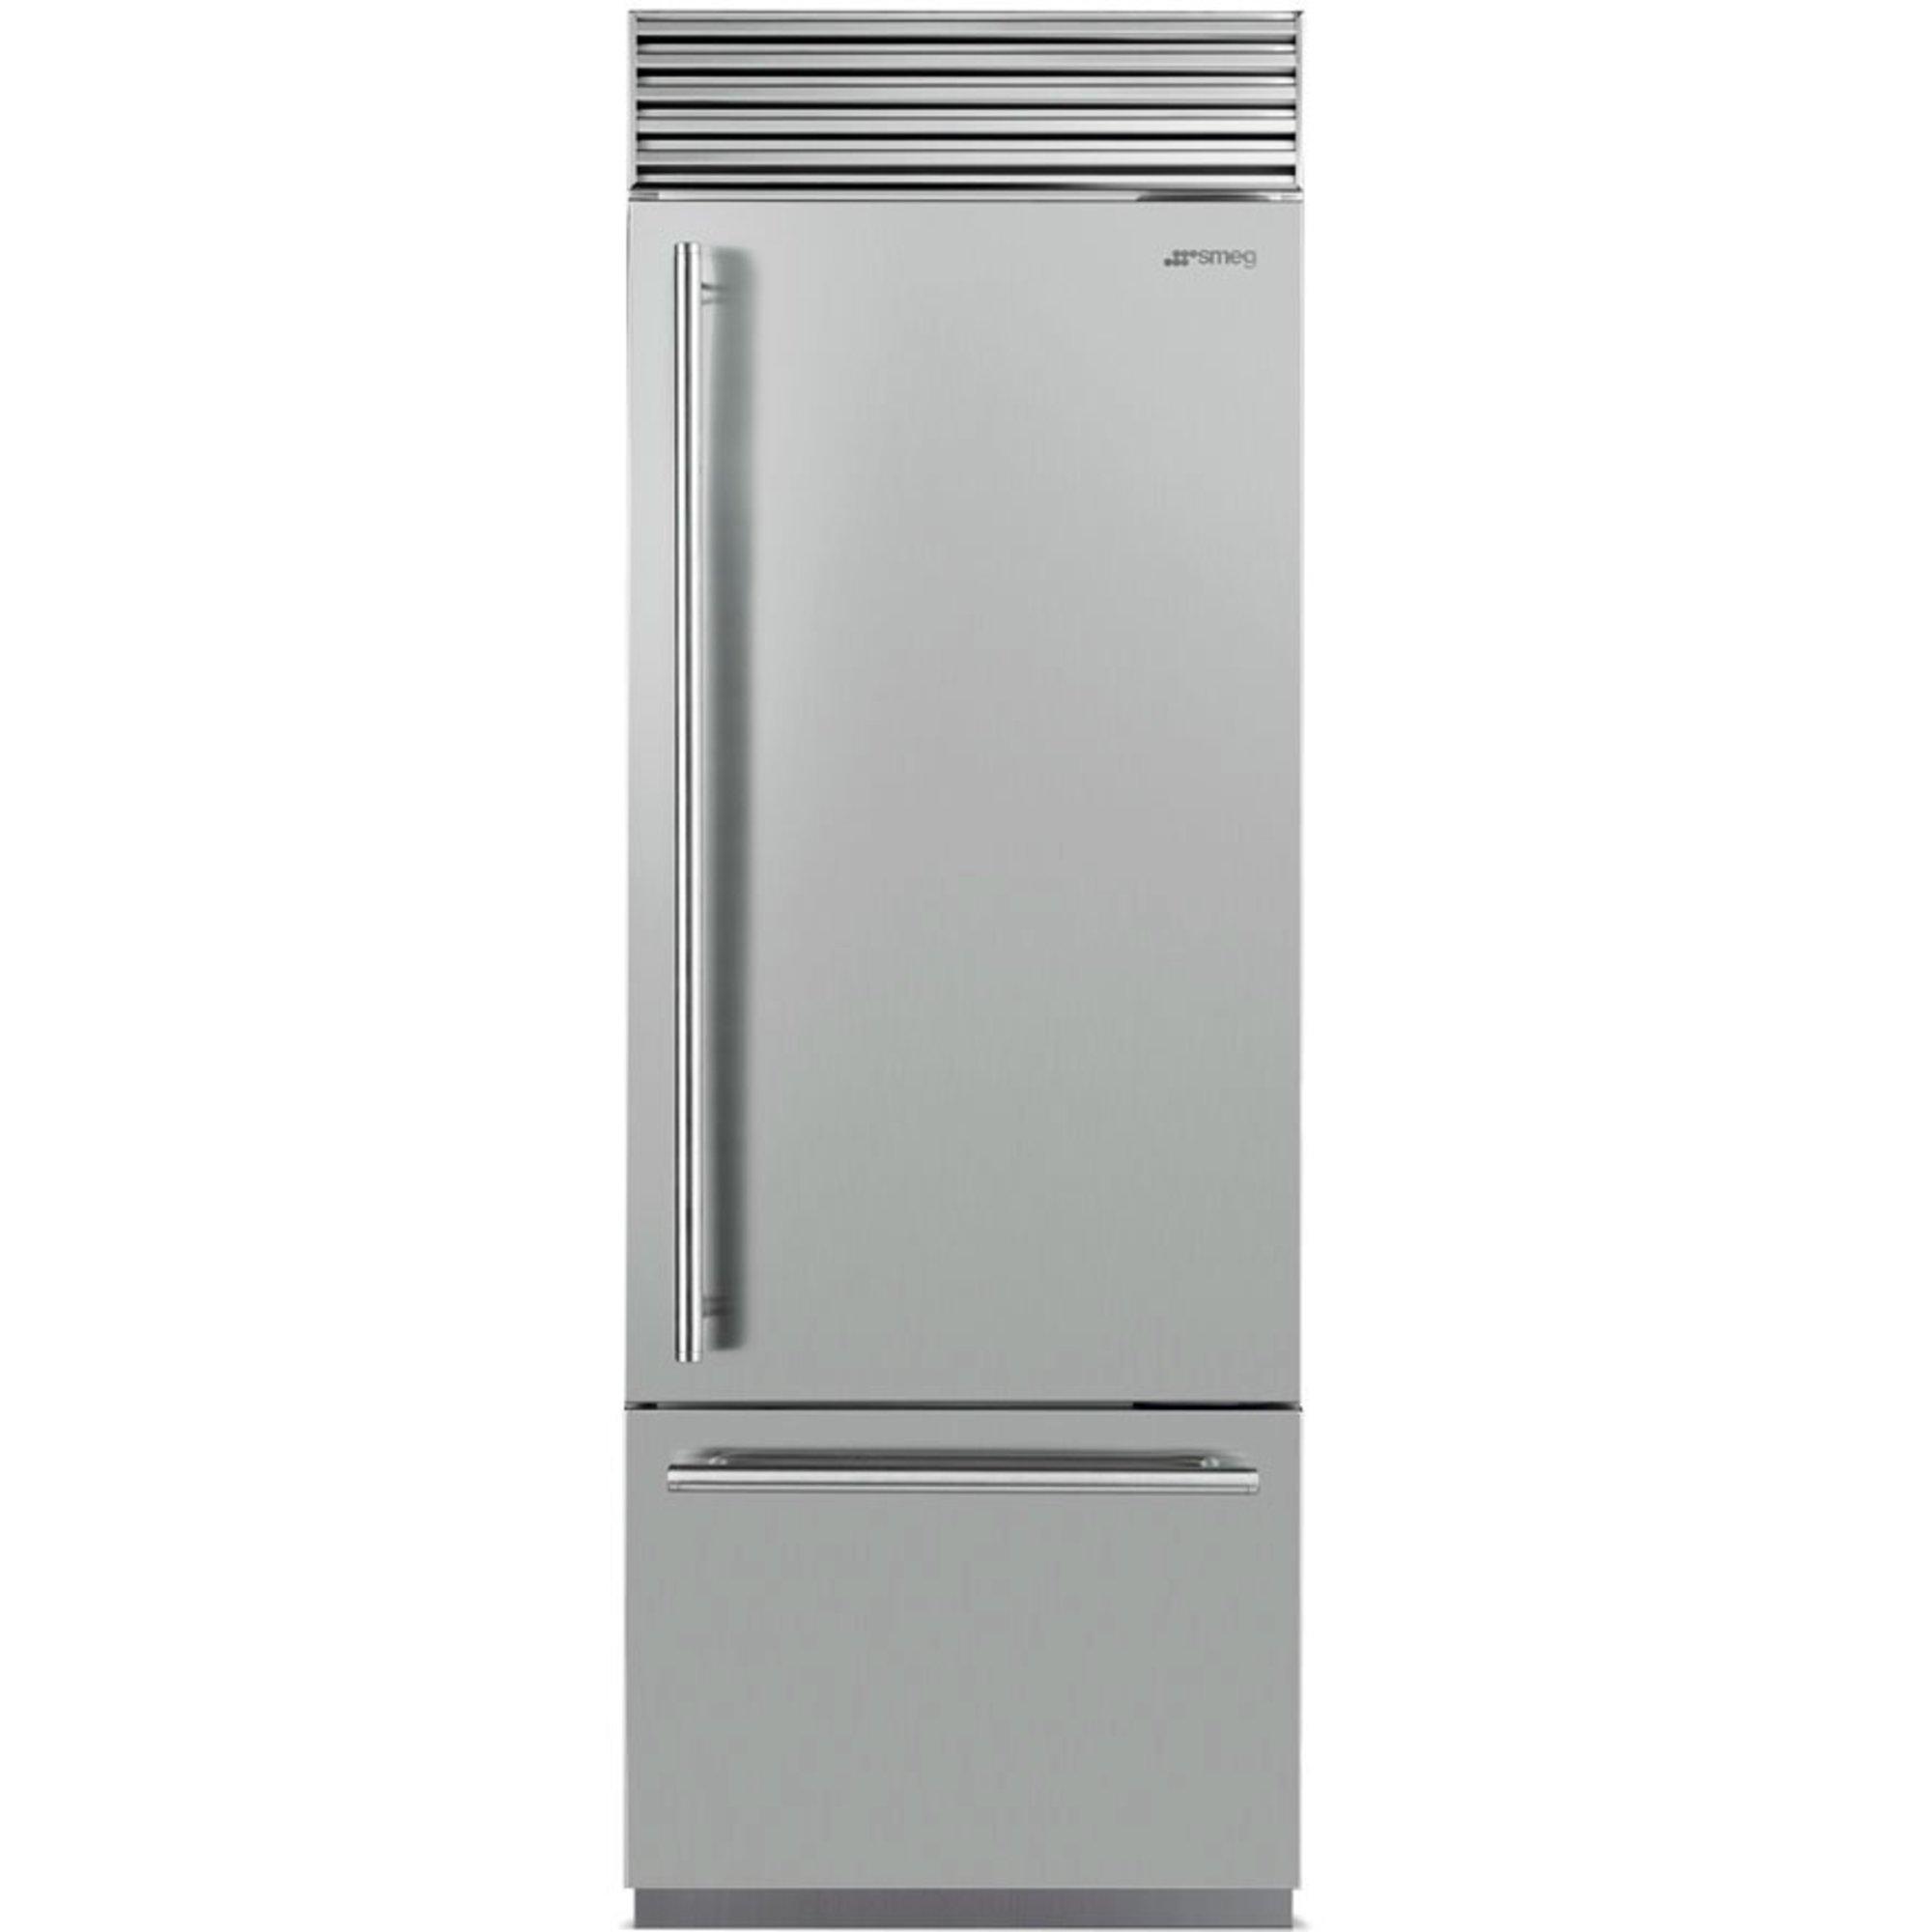 Smeg RF376RSIX Køle-/fryseskab højrehængt